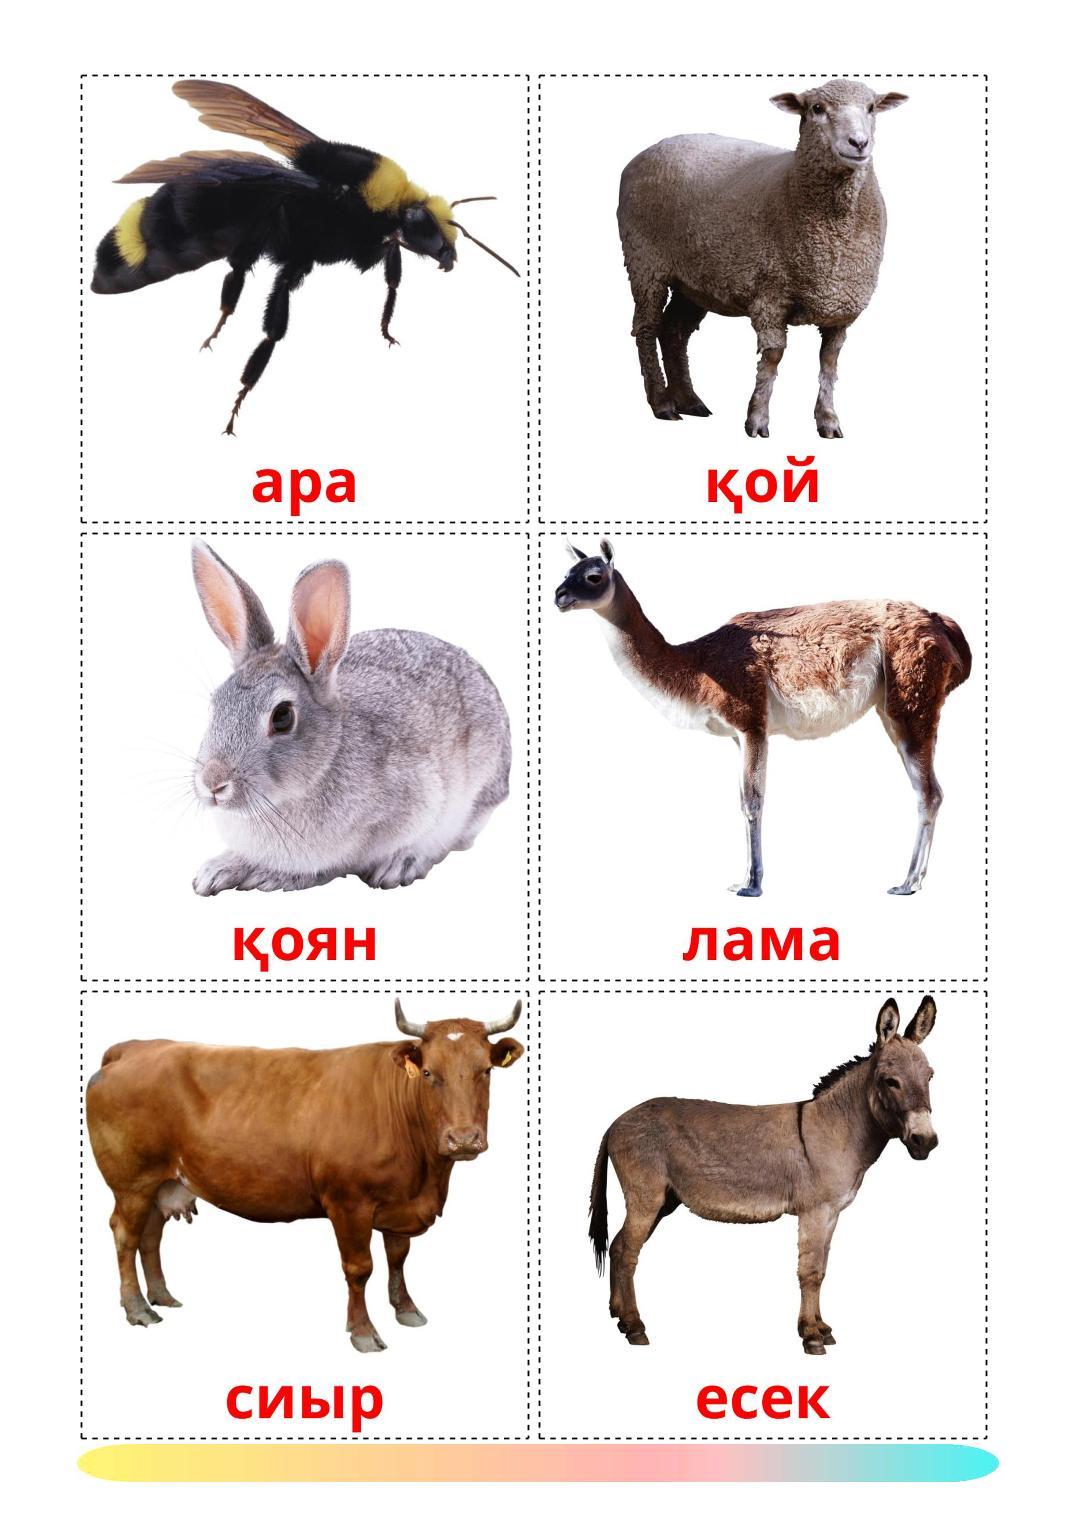 Farm animals - 15 Free Printable azerbaijani(cyrillic) Flashcards